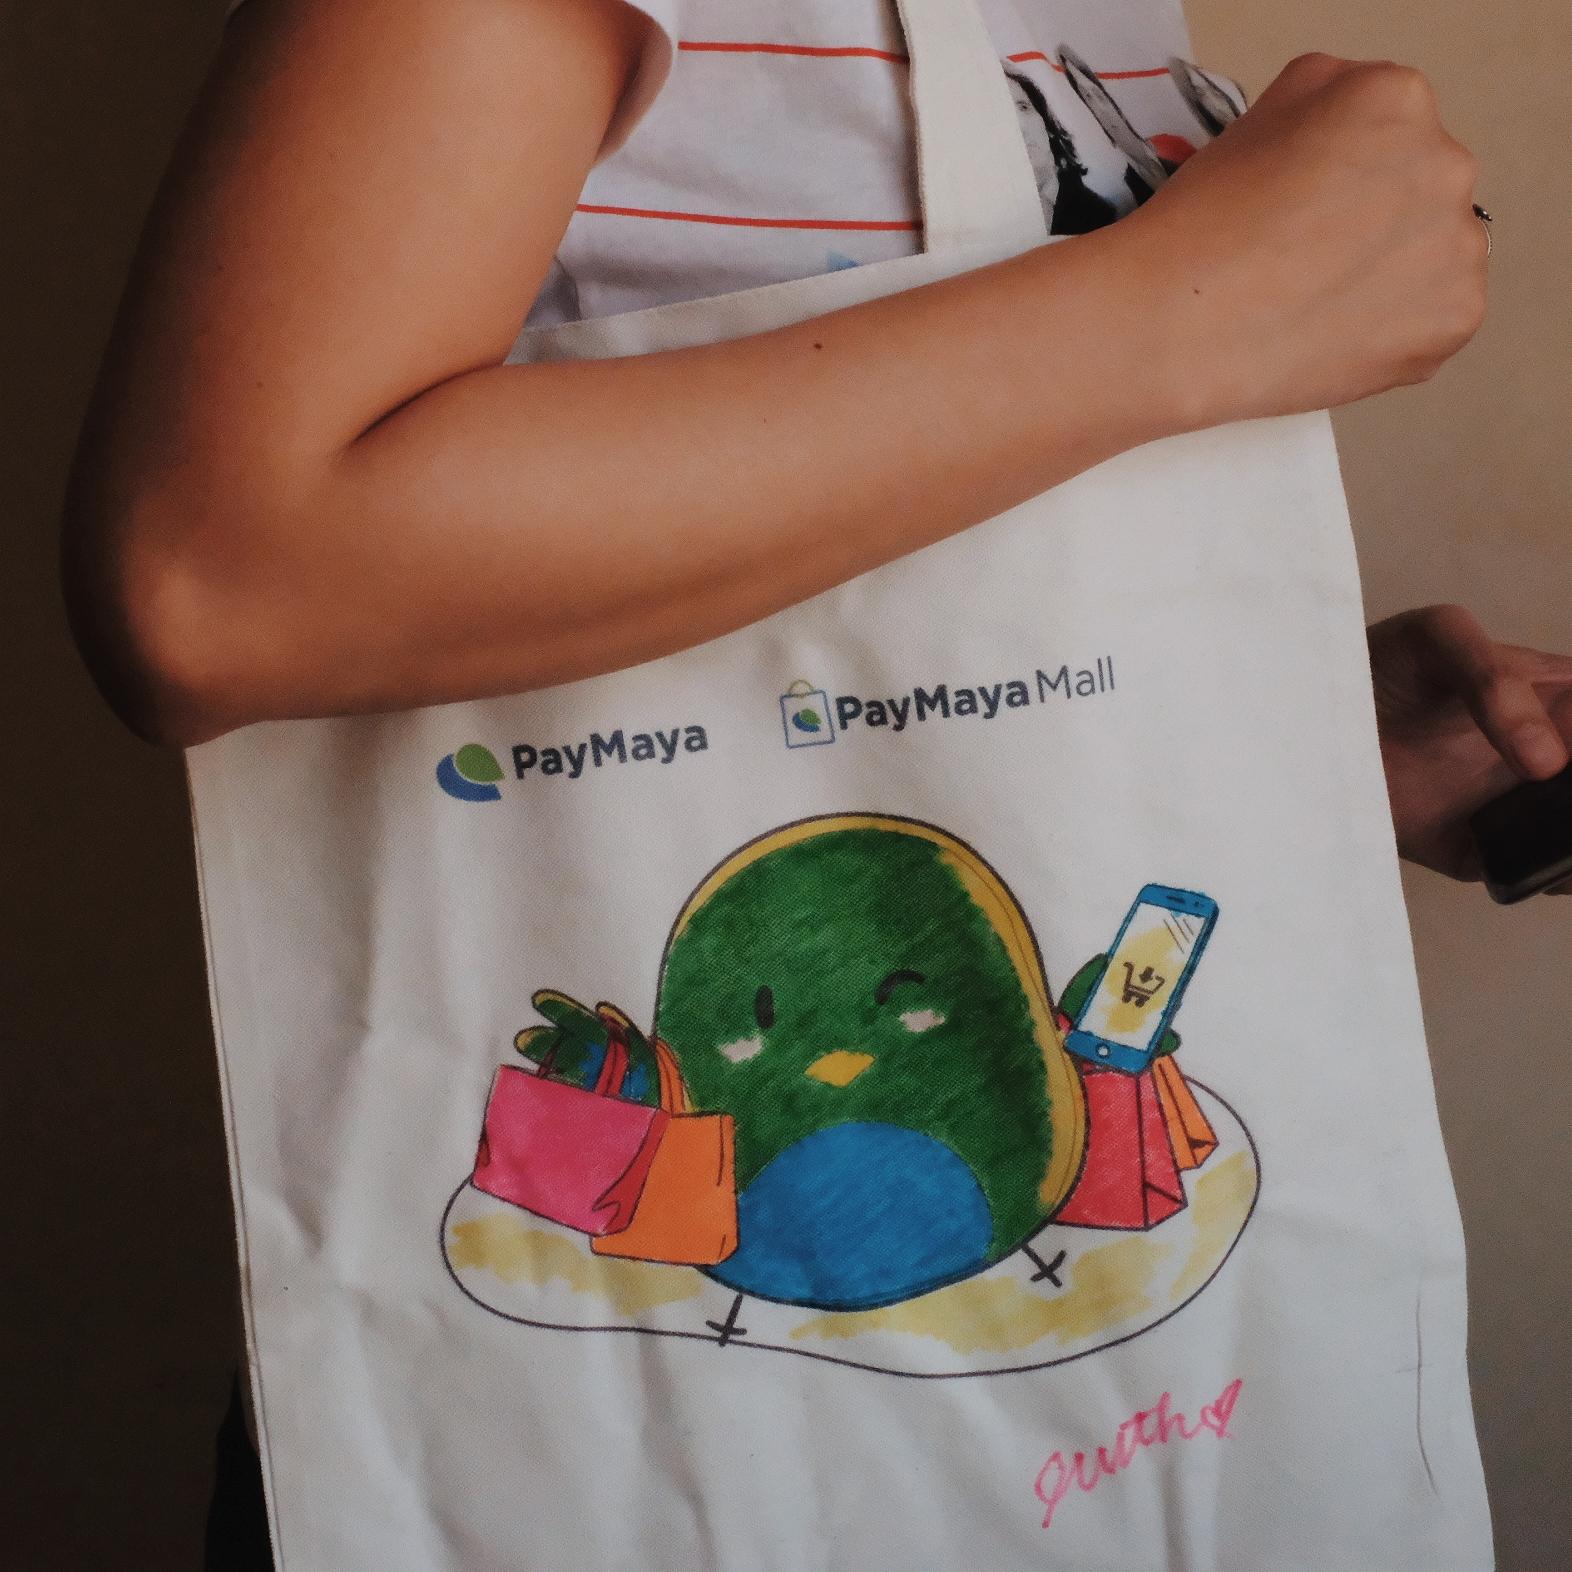 PayMaya Mall Promo and Partner Merchants